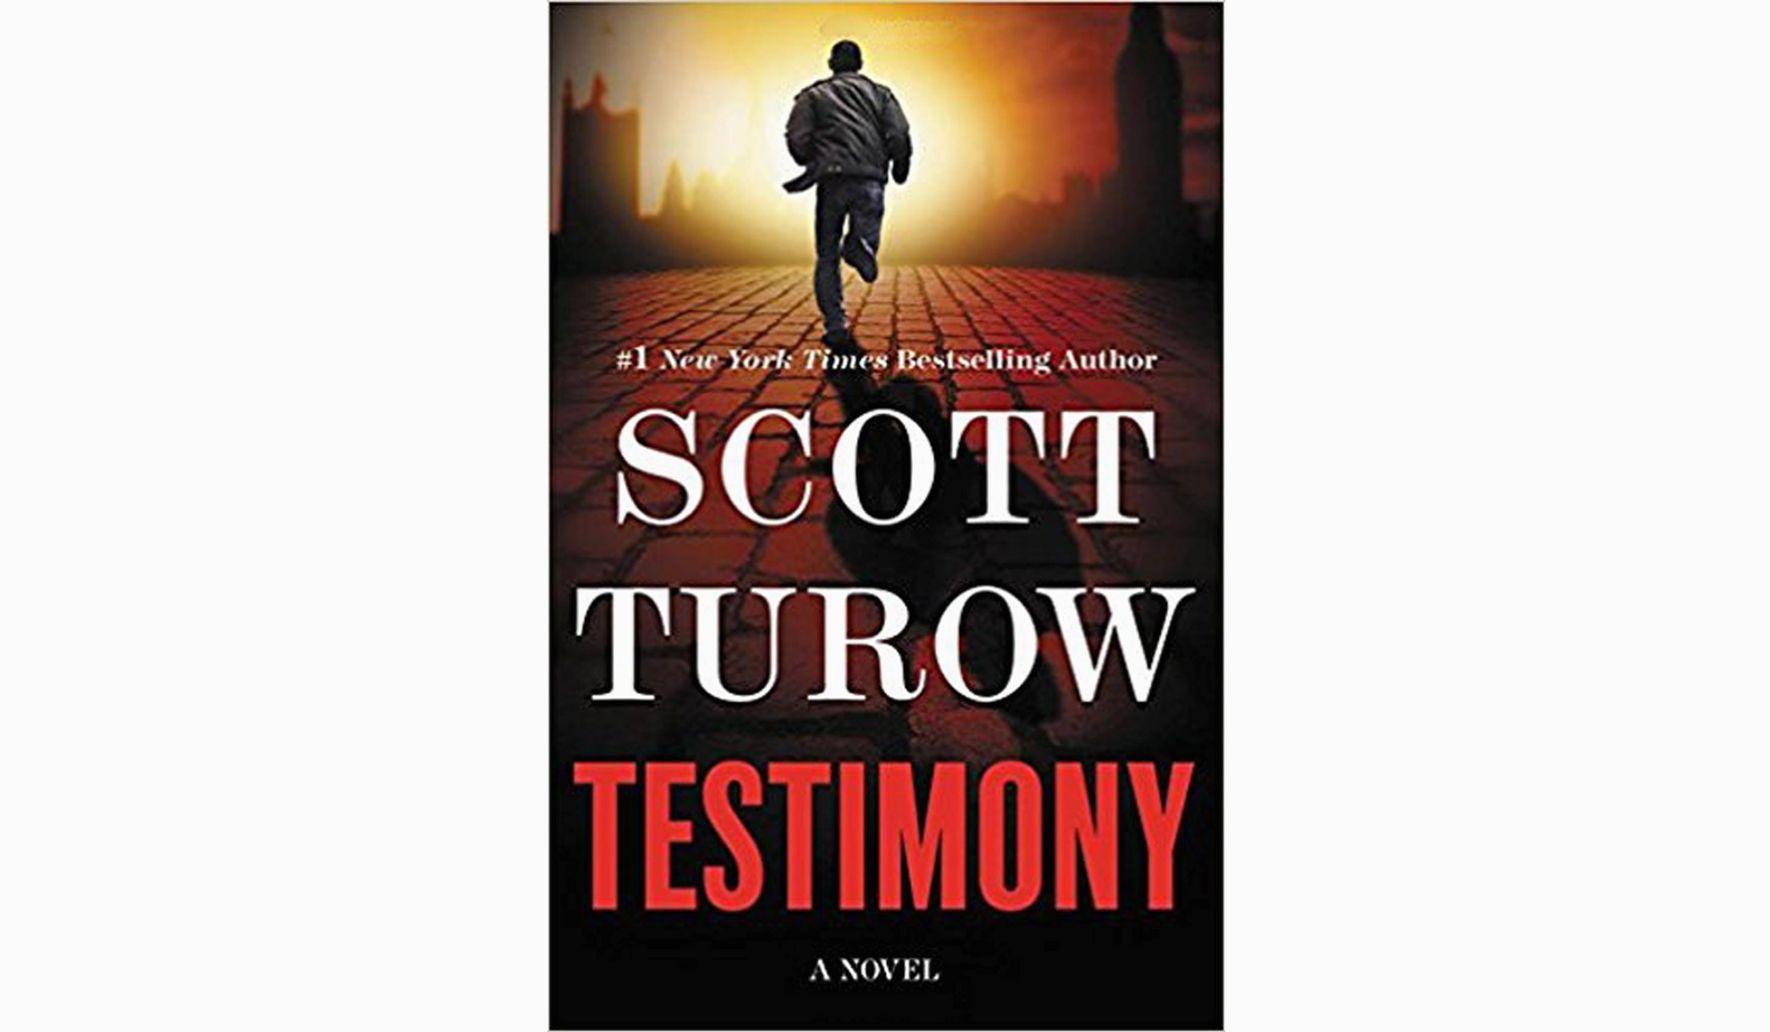 BOOK REVIEW: 'Testimony' - Washington Times